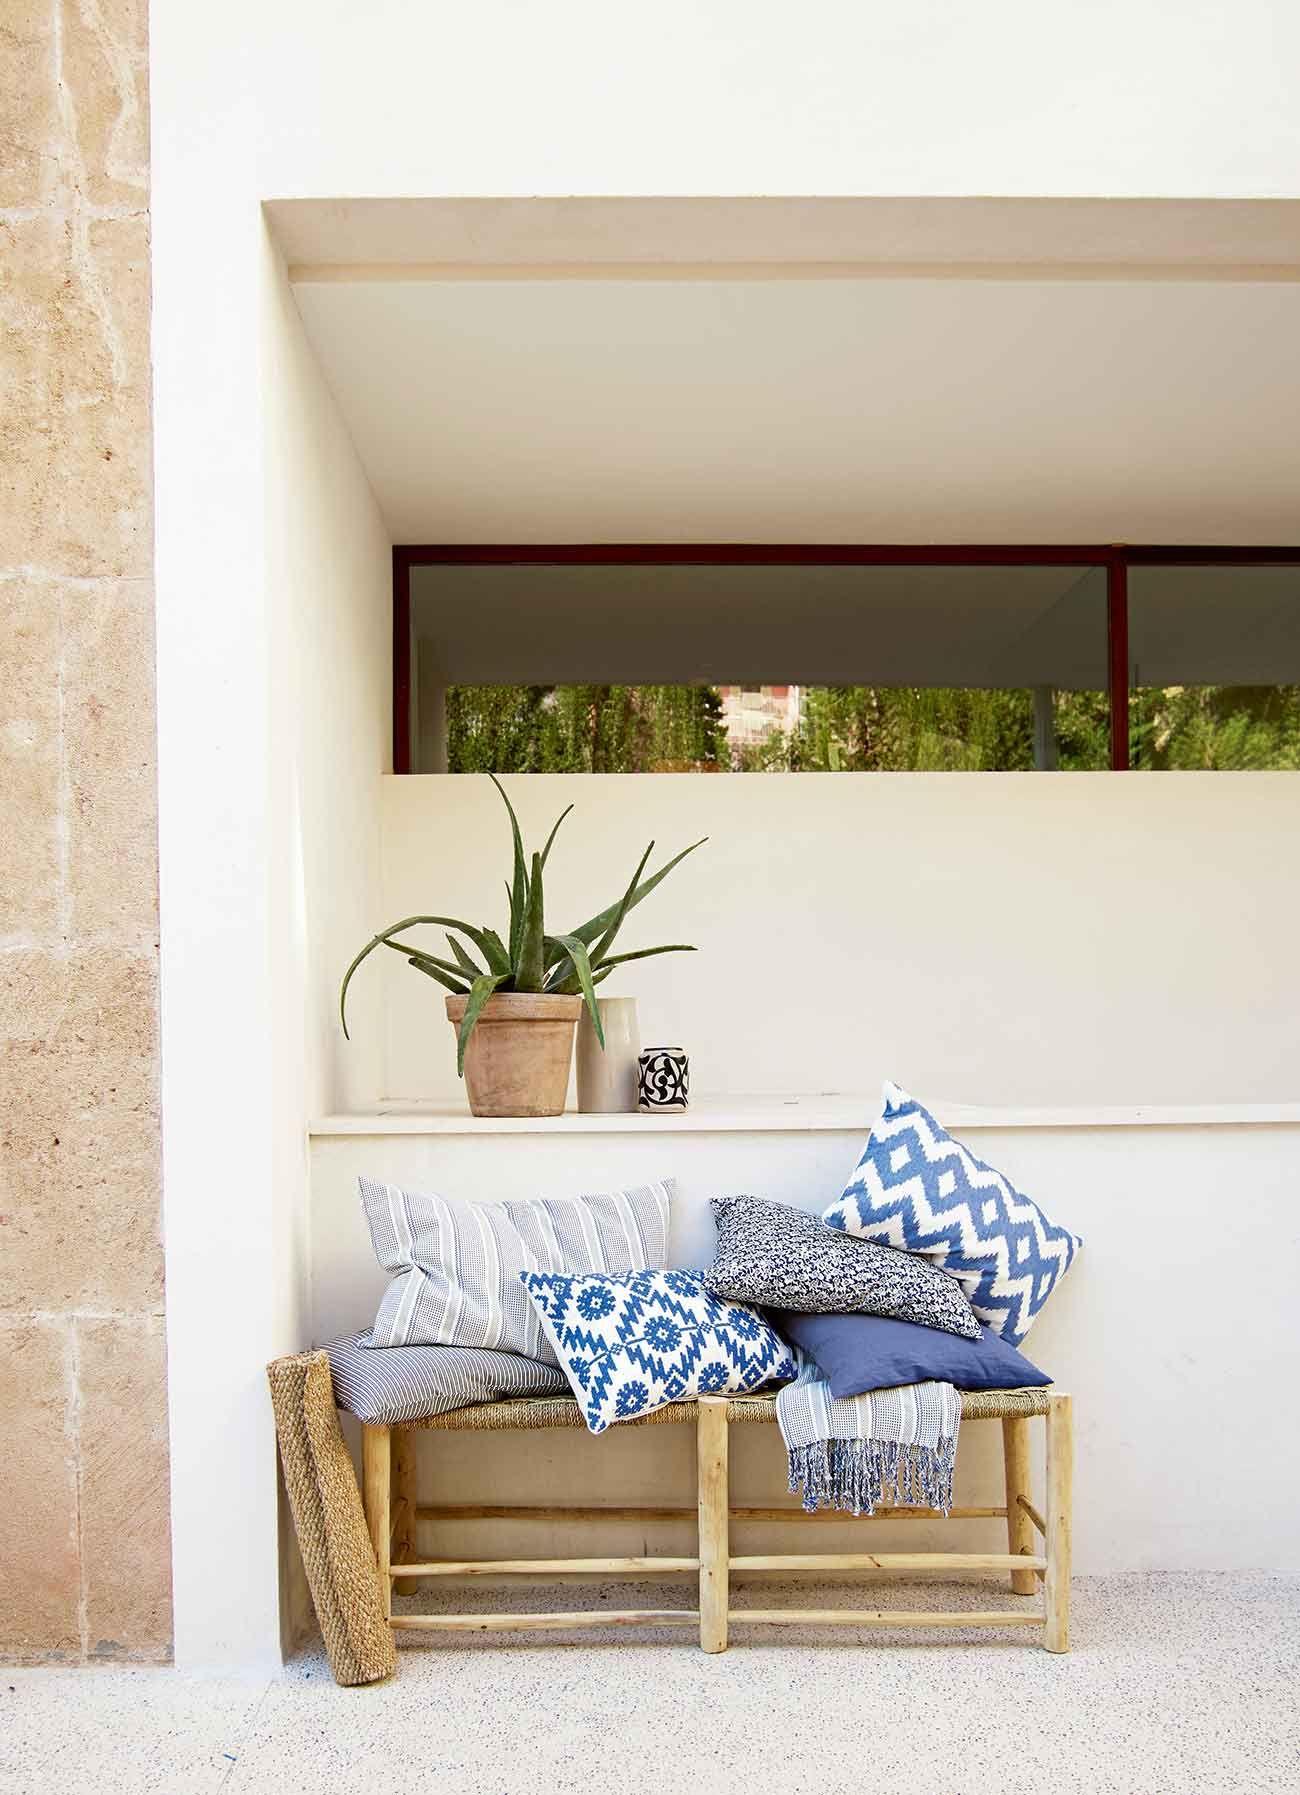 Tinekhome Kissen Blau Bambusmobel Mit Bildern Terrassen